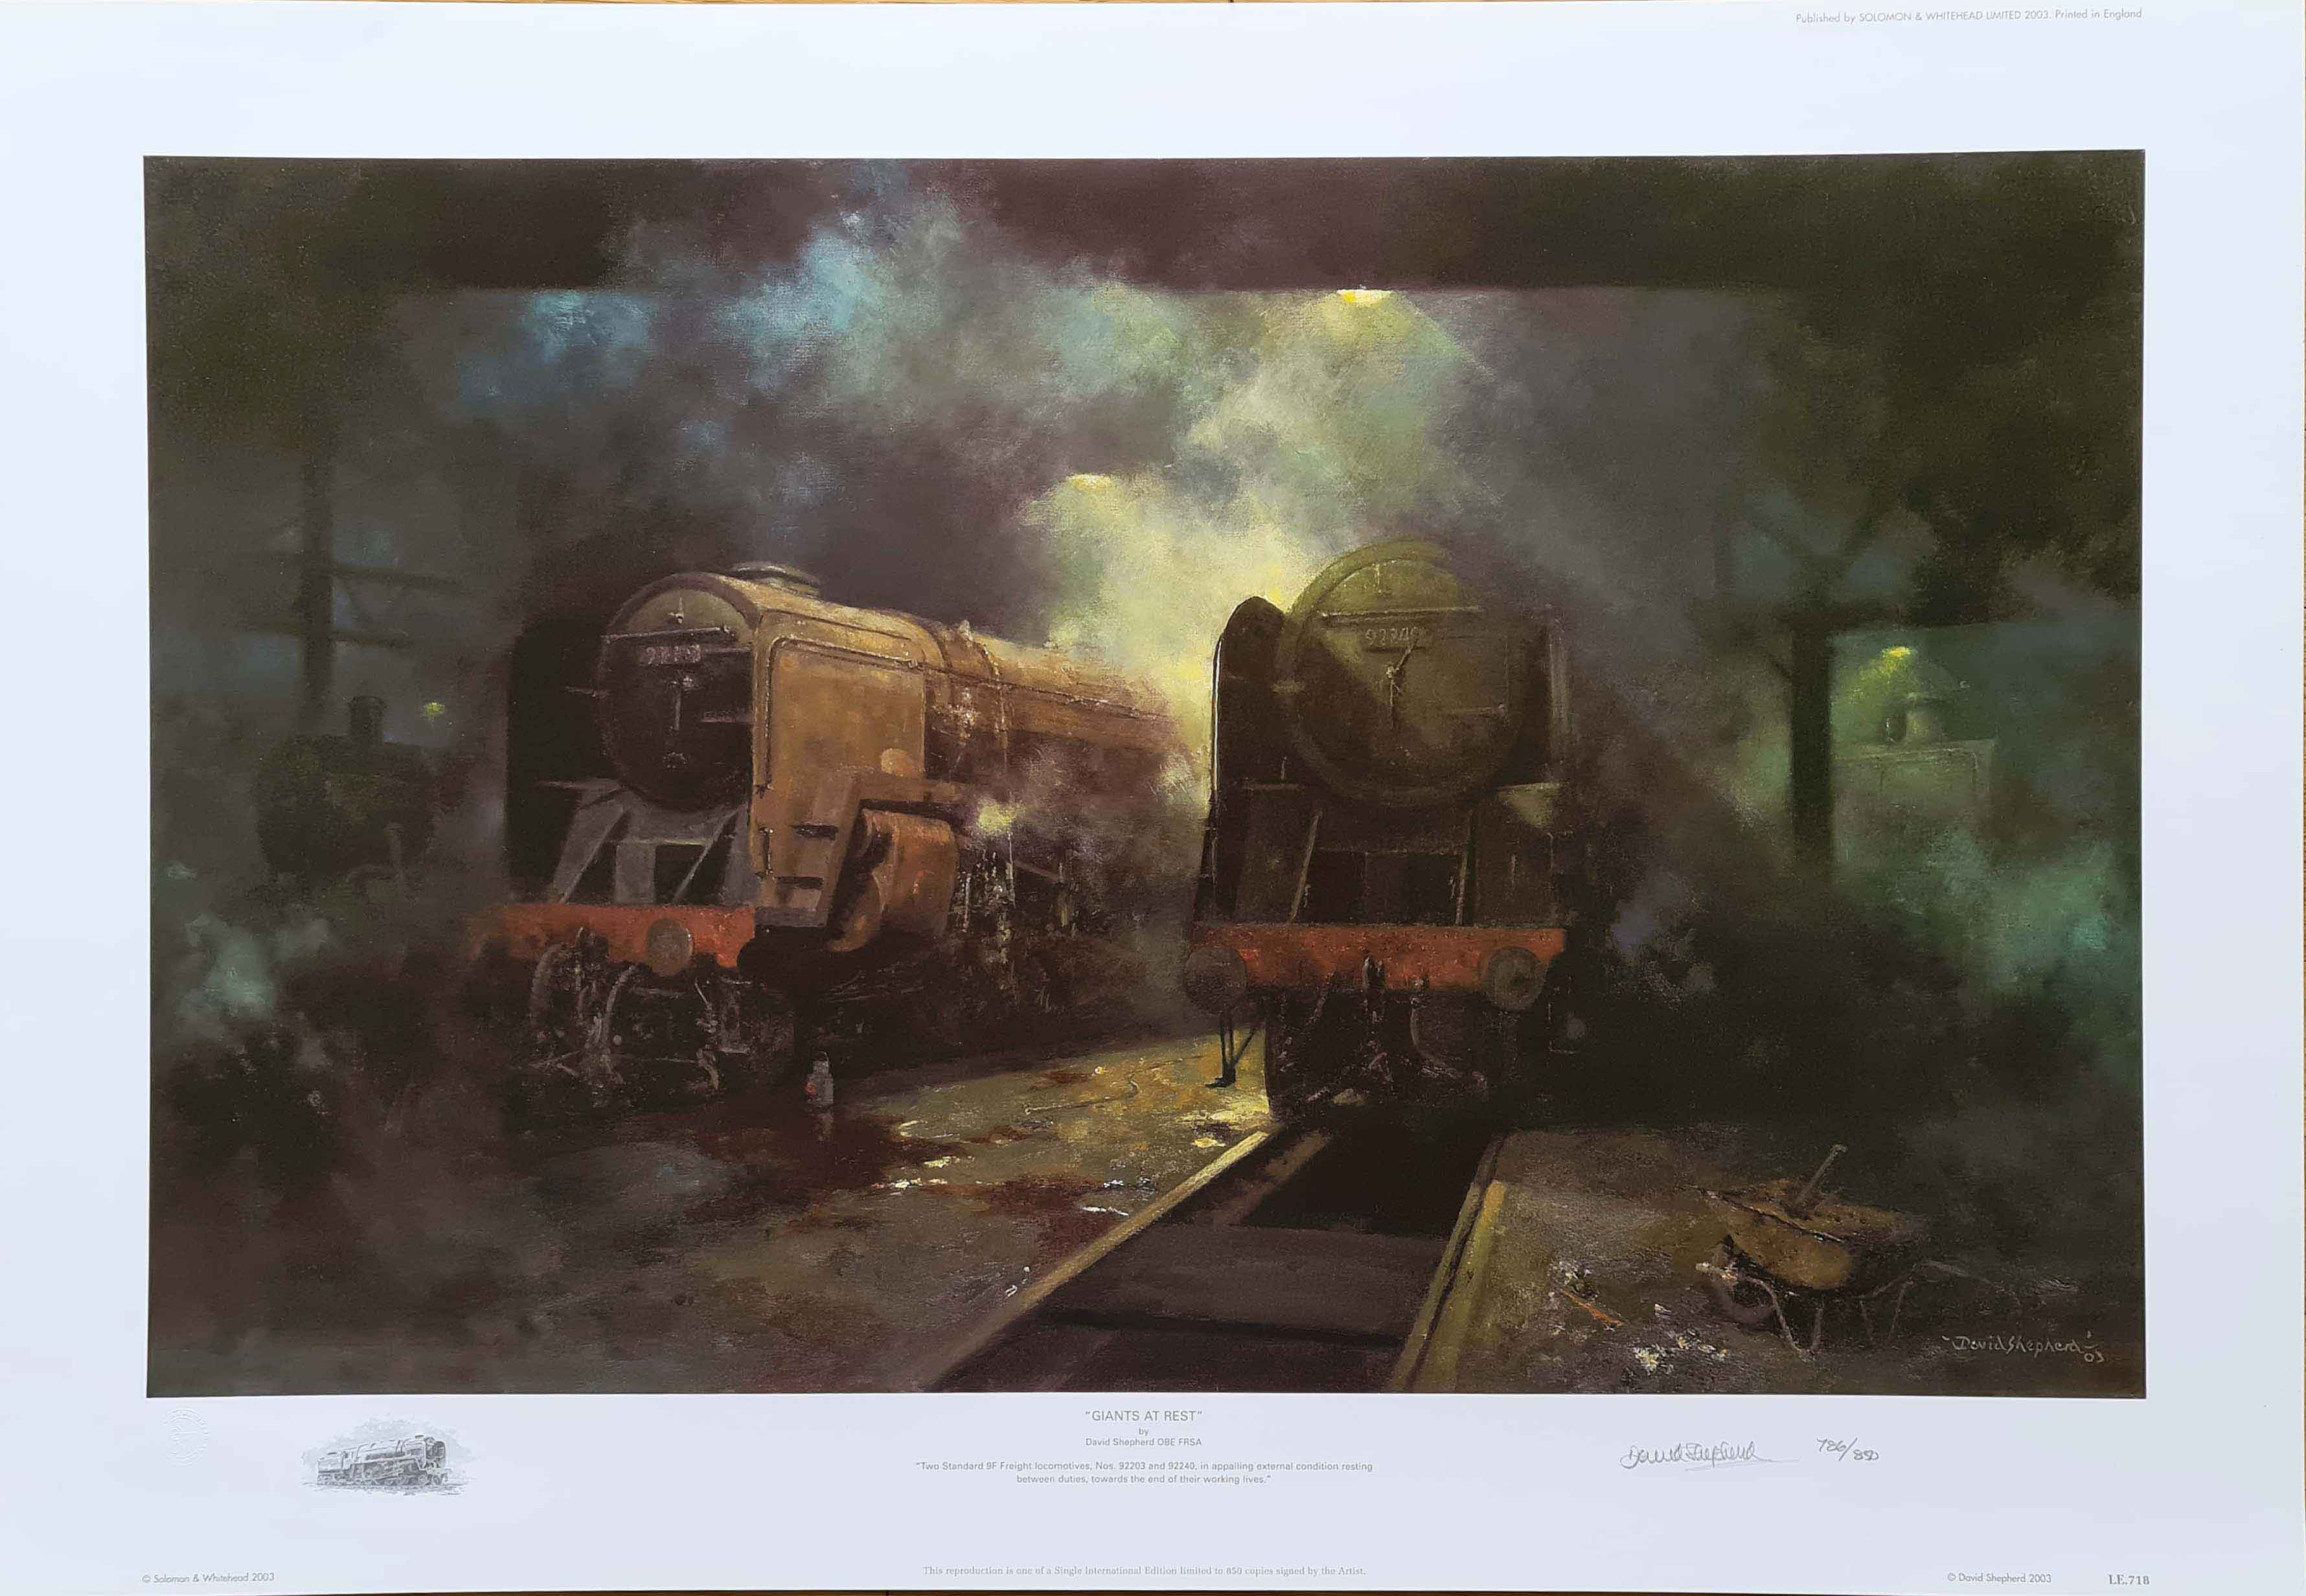 david shepherd Giants at Rest, Trains